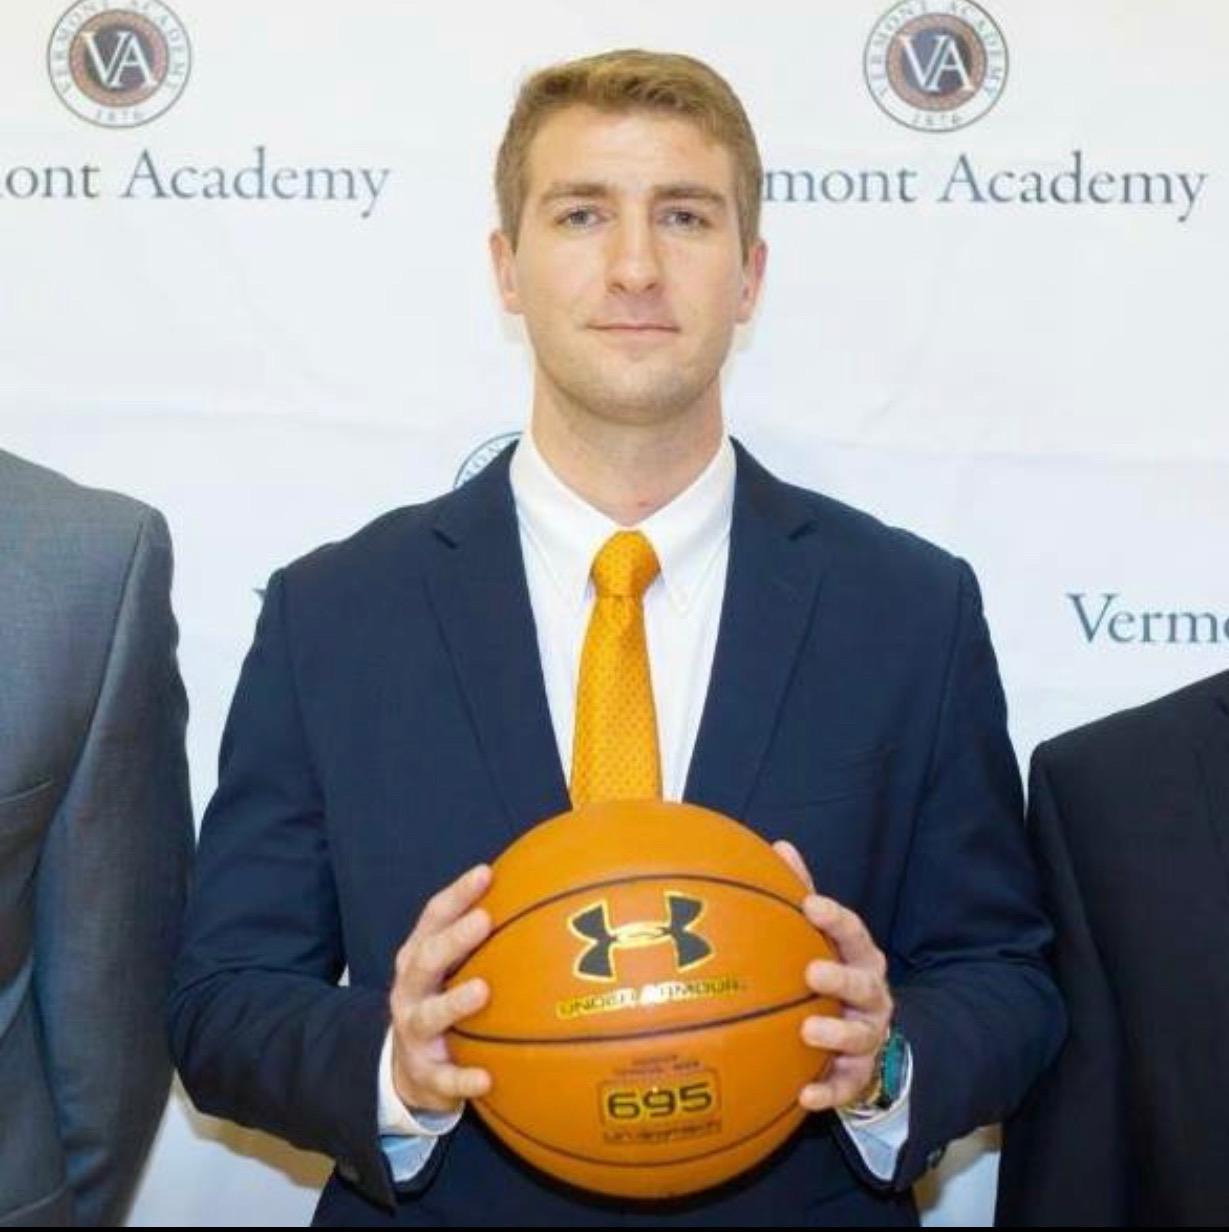 alex popp, head coach, vermont academy men's basketball